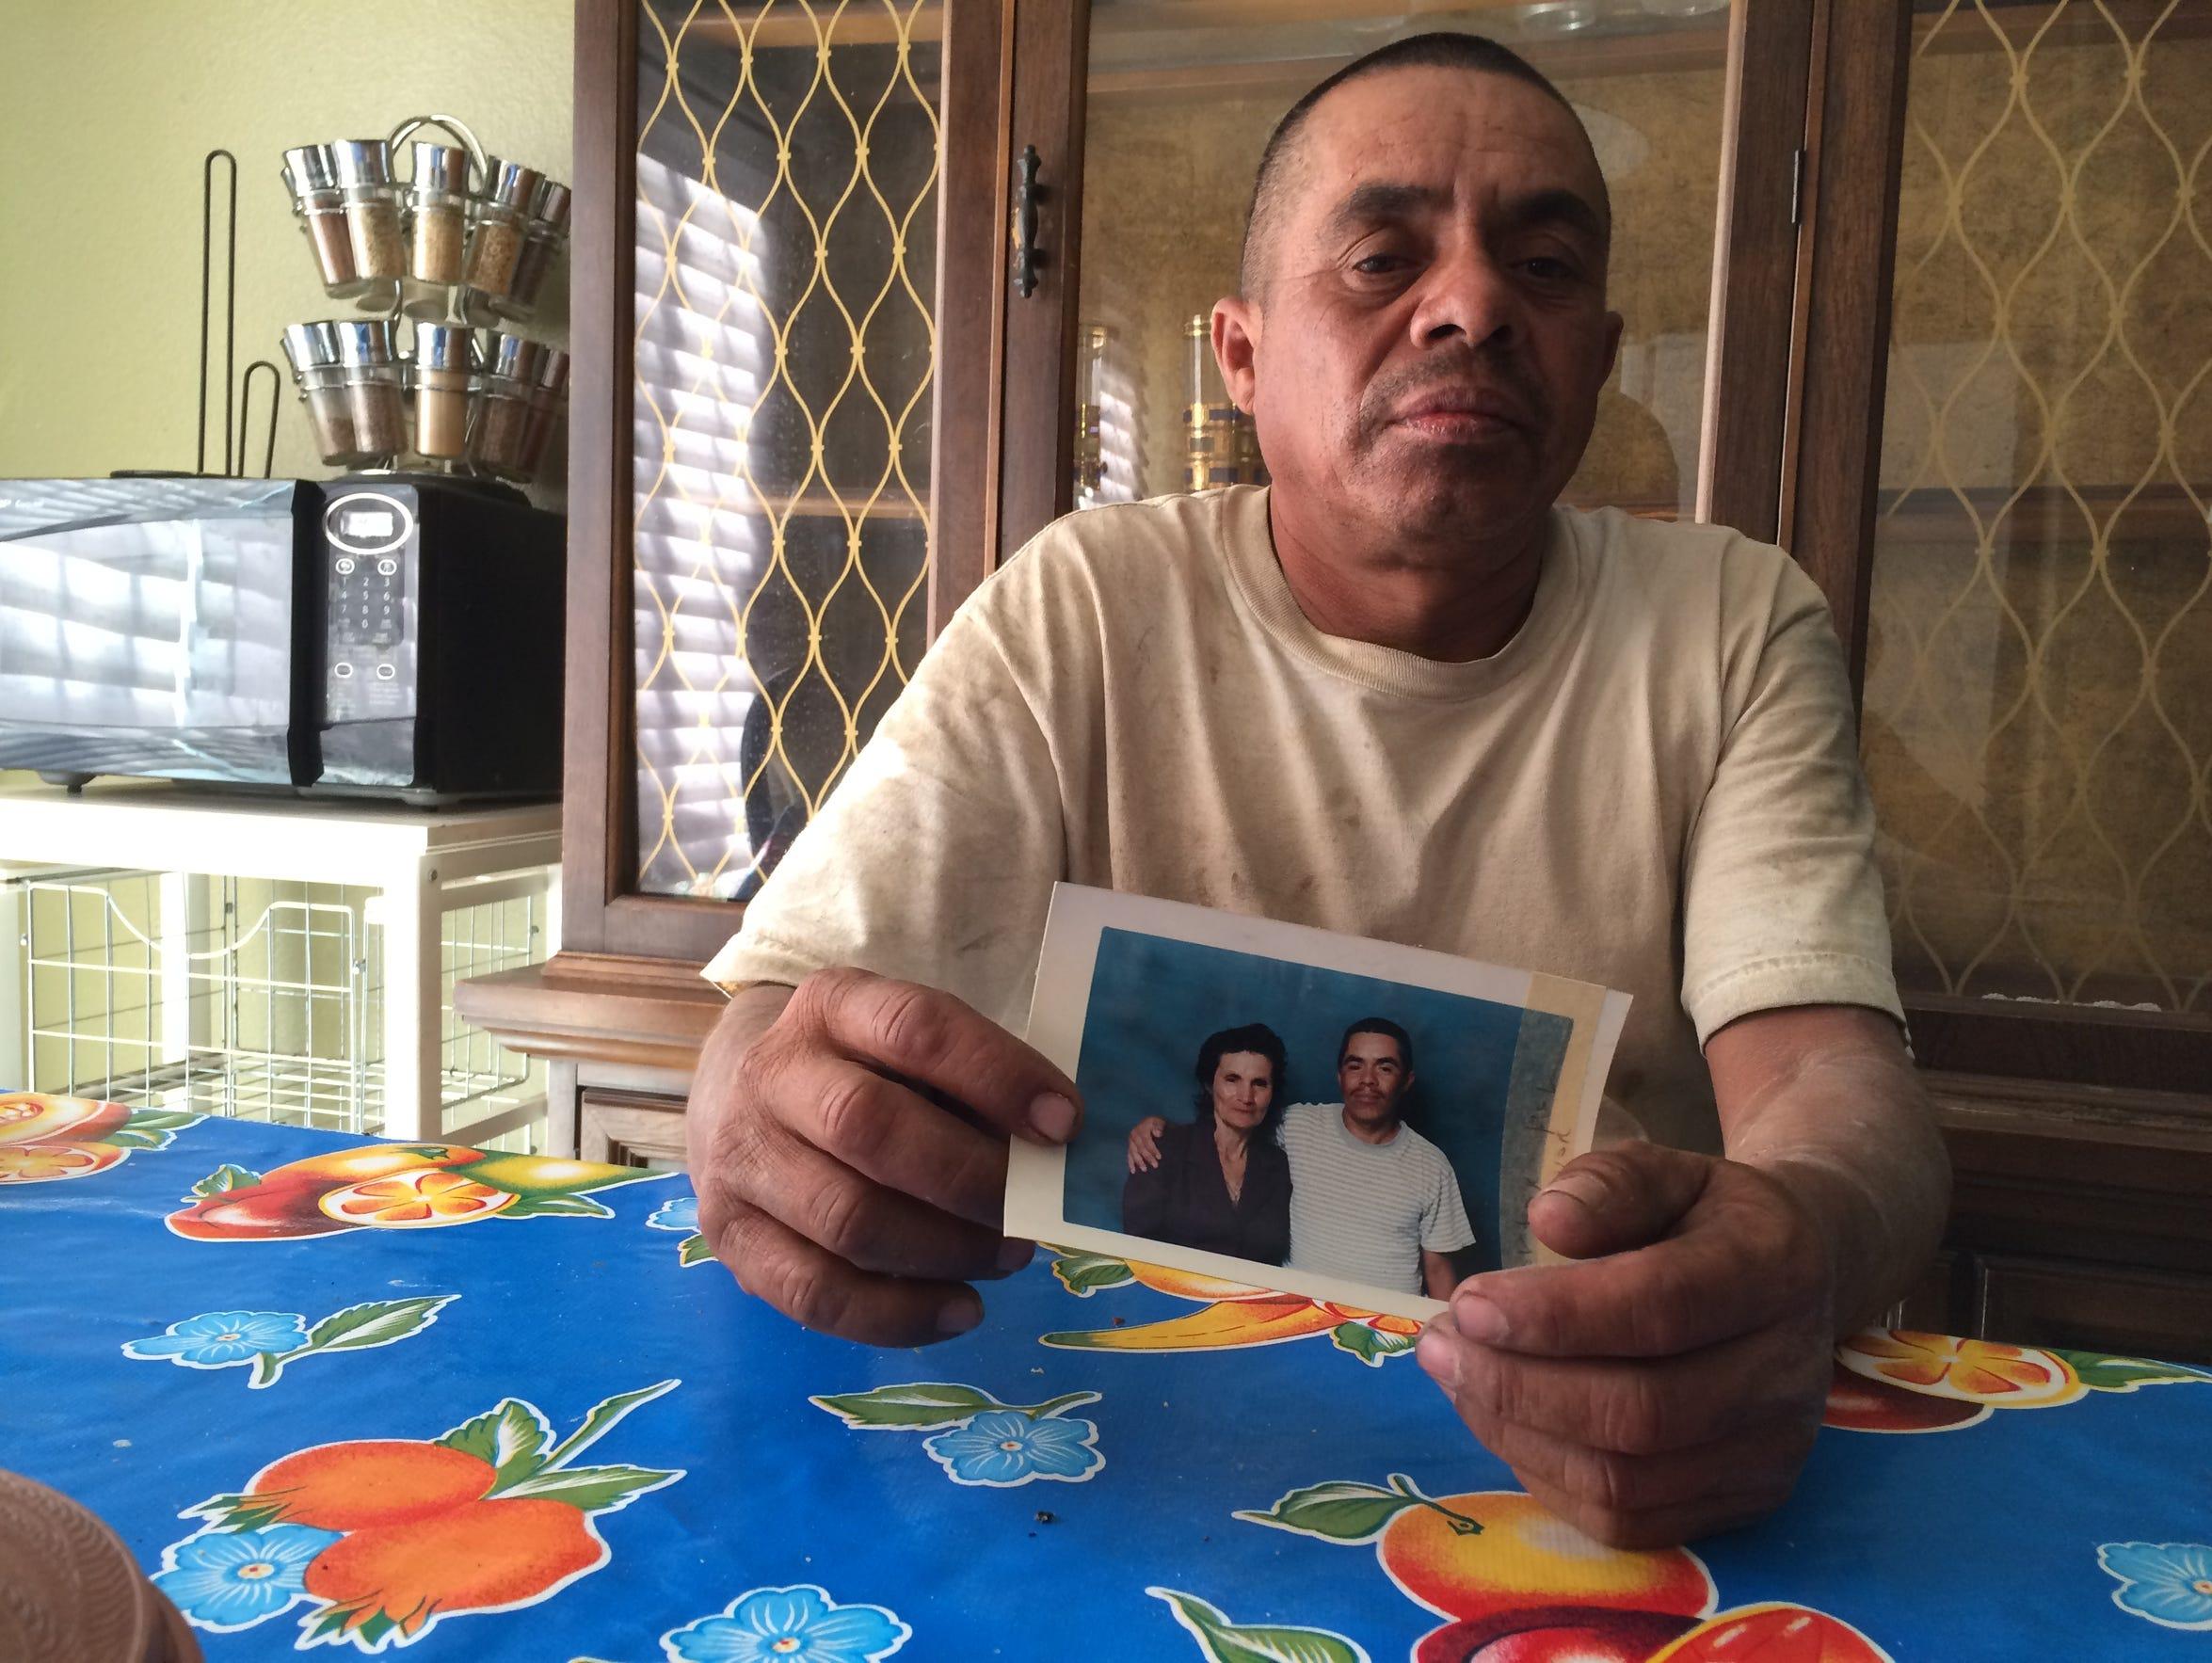 Francisco Alvarez Bautista holds a photo of him and